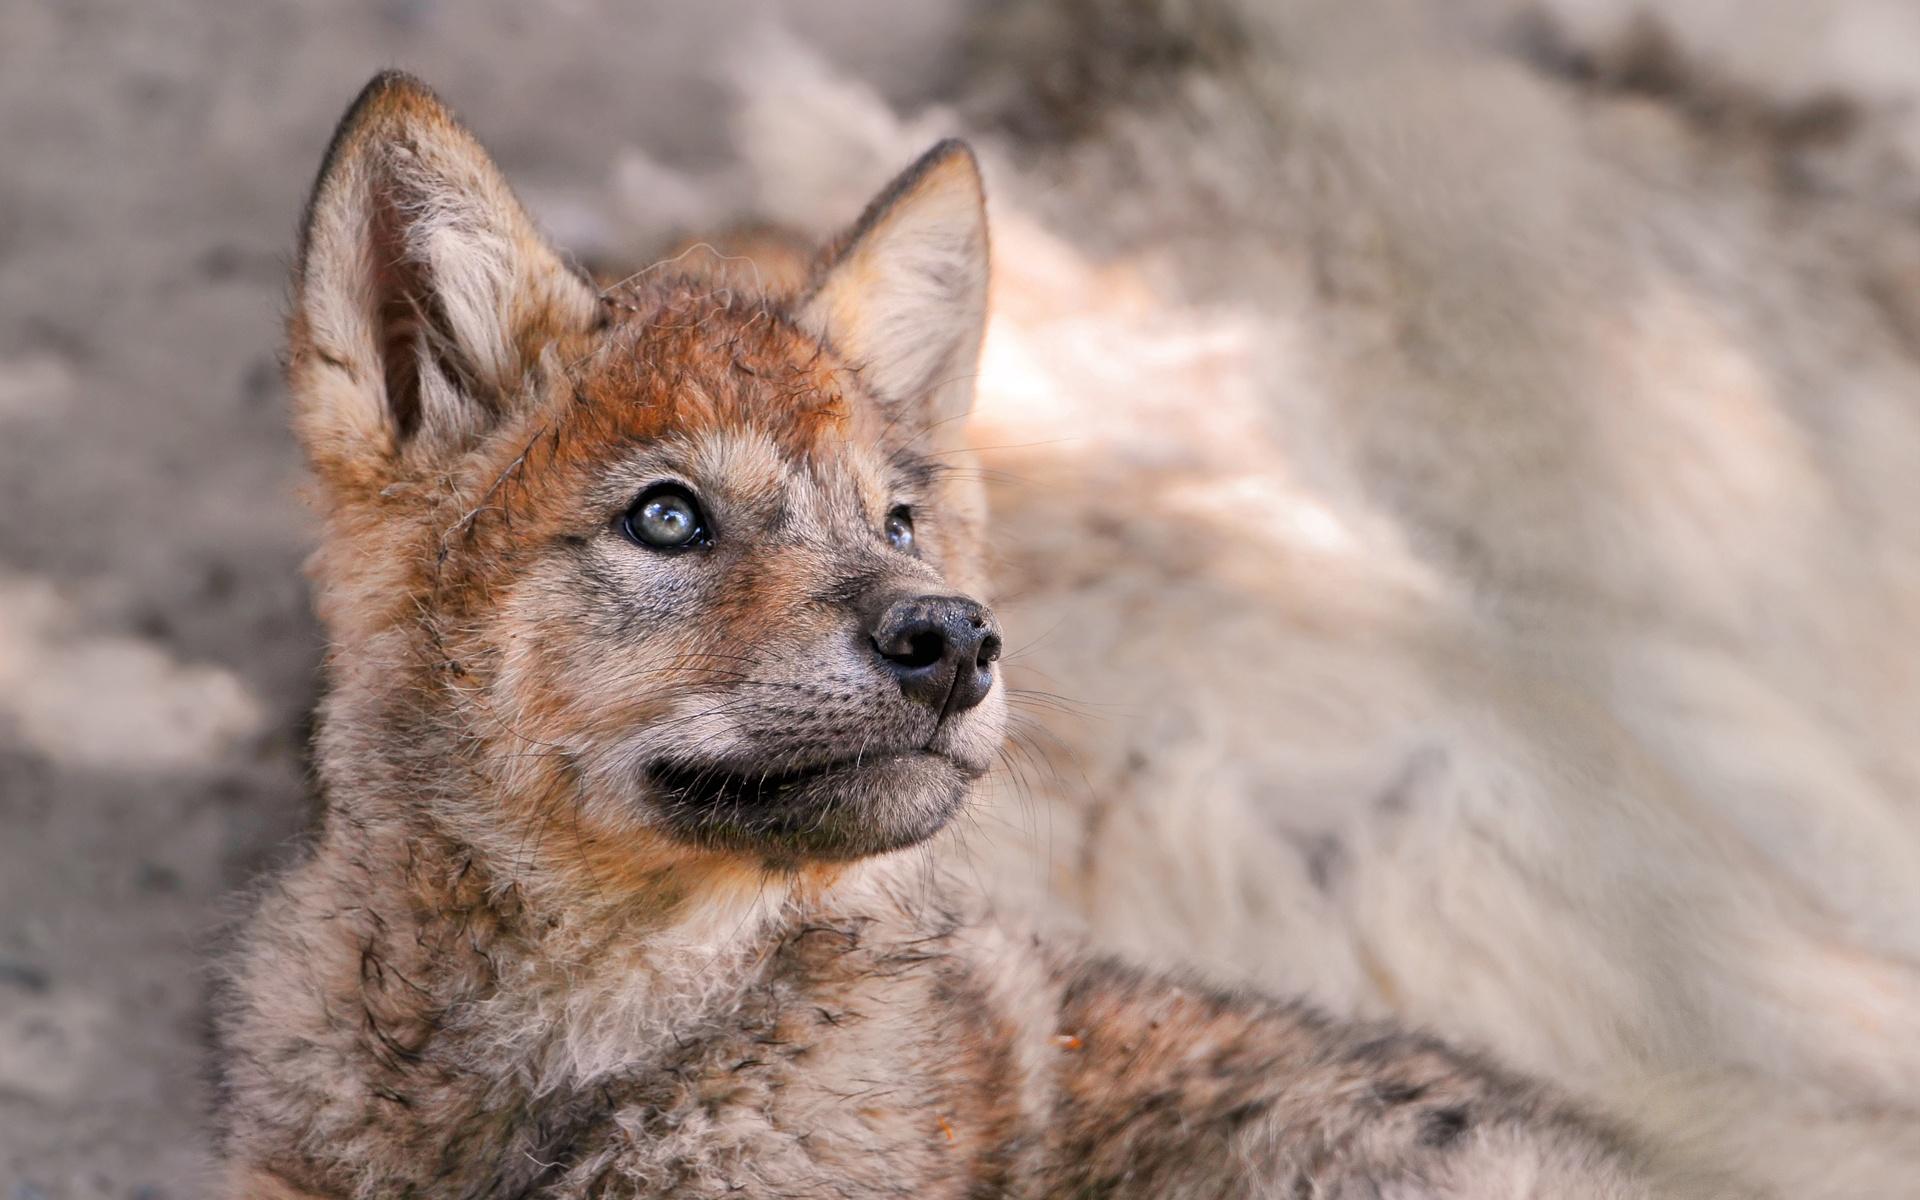 47+] Cute Baby Wolf Wallpaper on WallpaperSafari